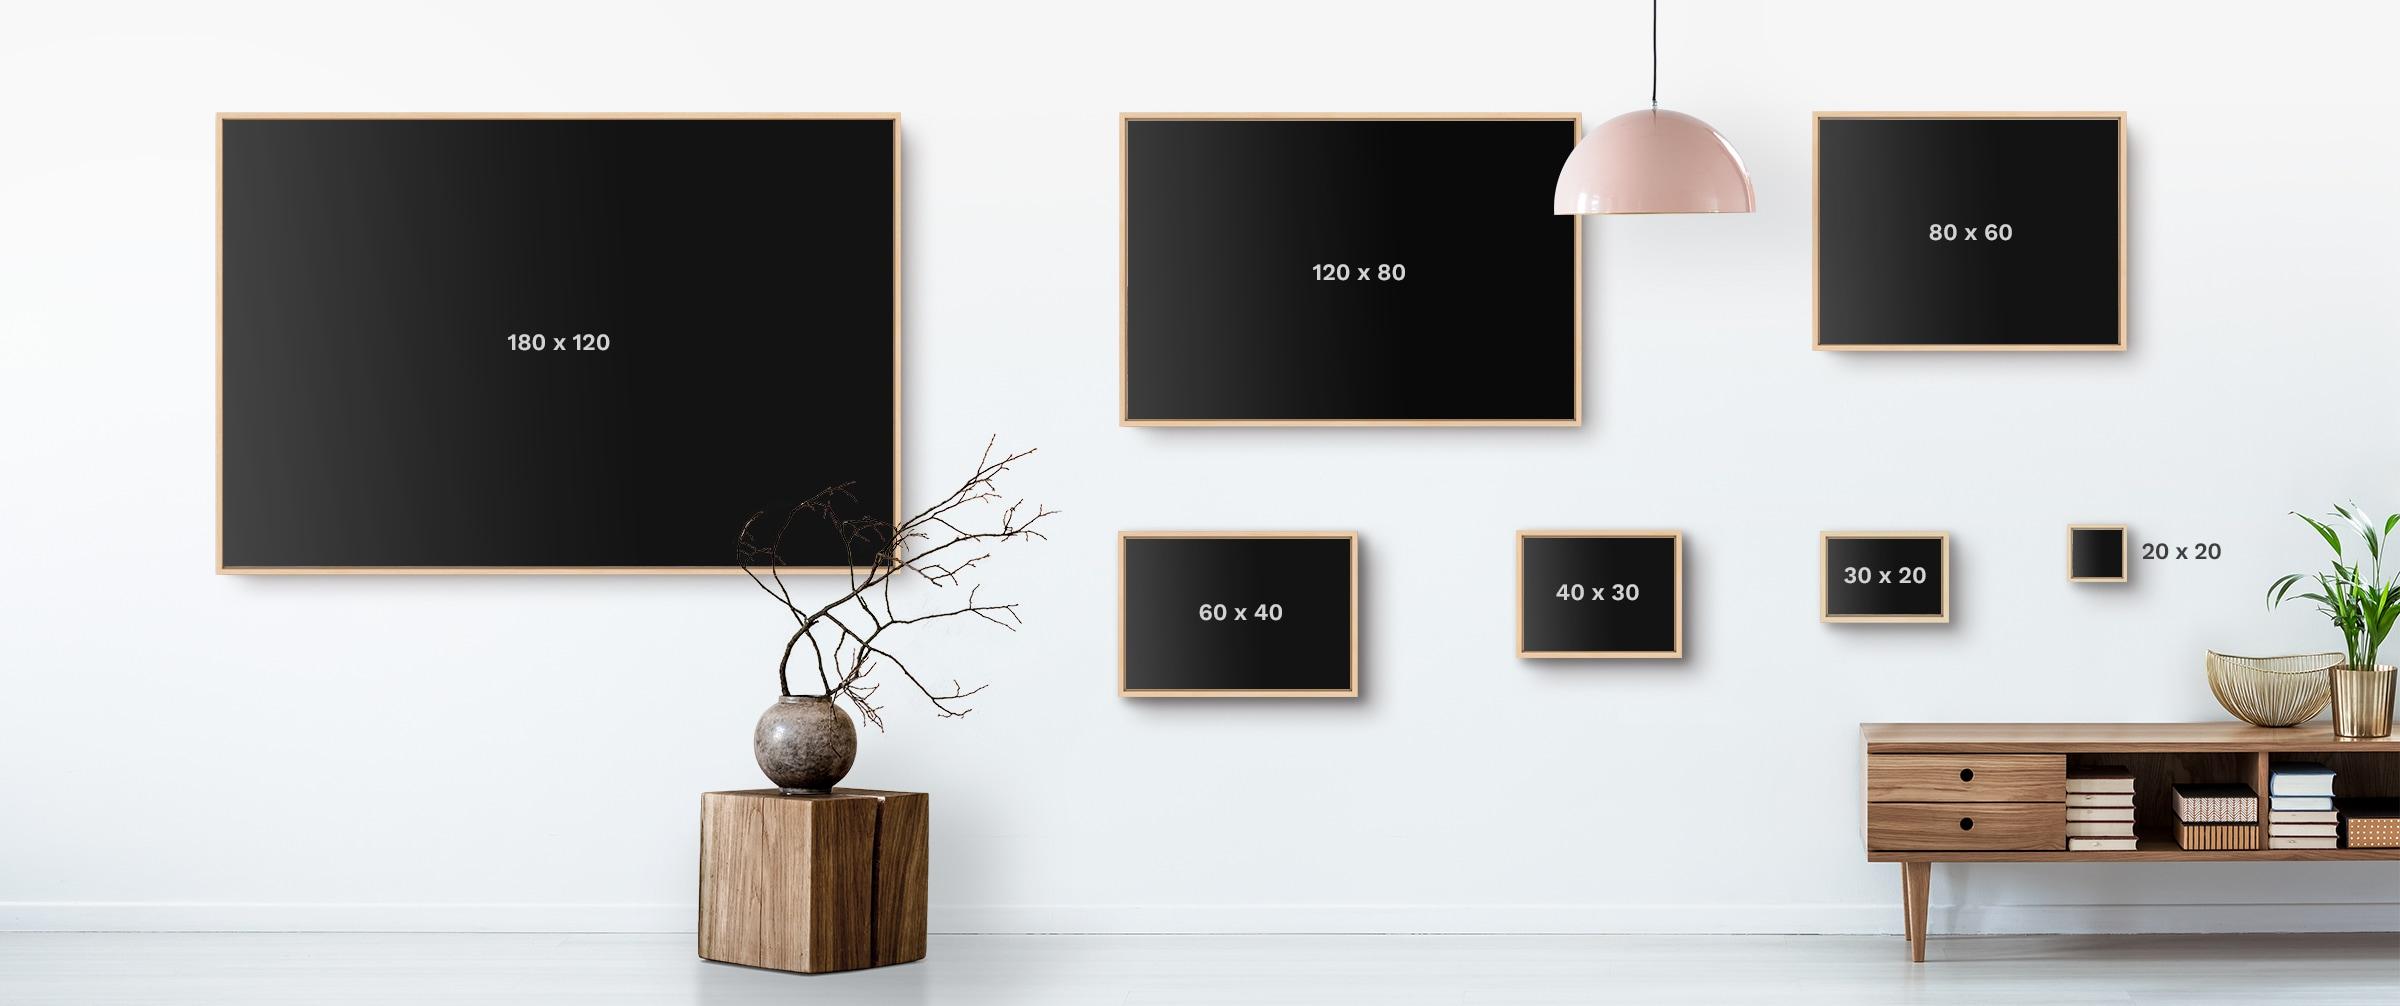 size-frise-frame (1).jpg